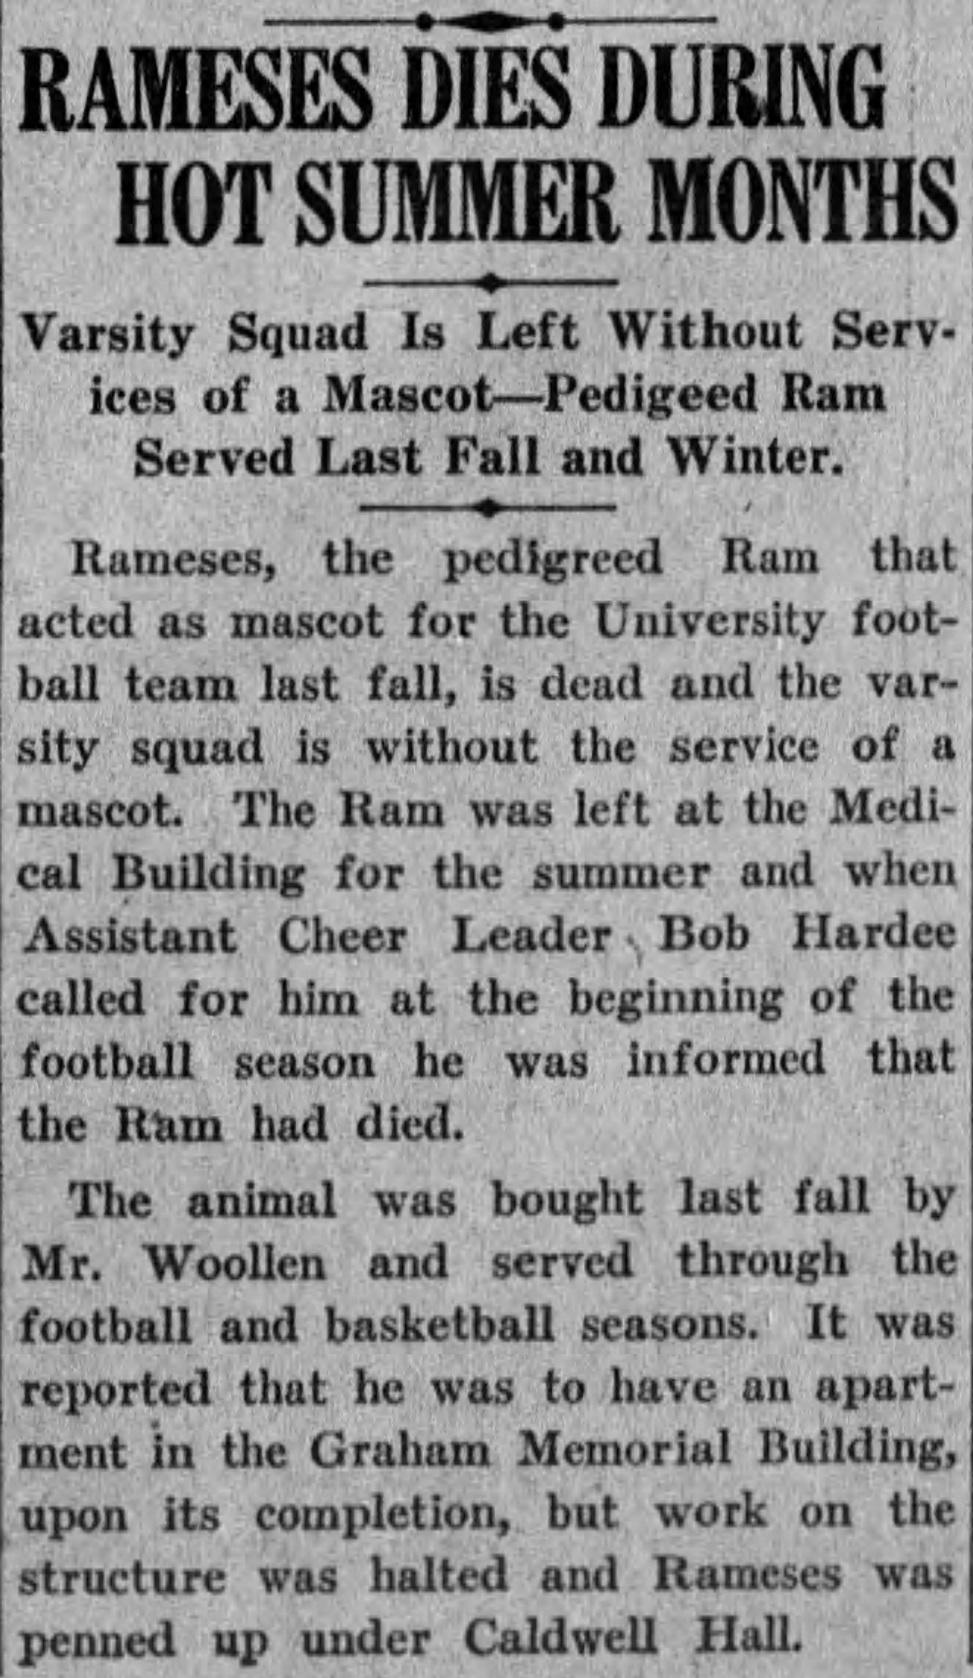 """Rameses Dies during Hot Summer Months,"" Tar Heel (Chapel Hill, NC), Sep. 29, 1925, accessed on March 26, 2017, //universityofnorthcarolinaatchapelhill.newspapers.com/image/67919582."